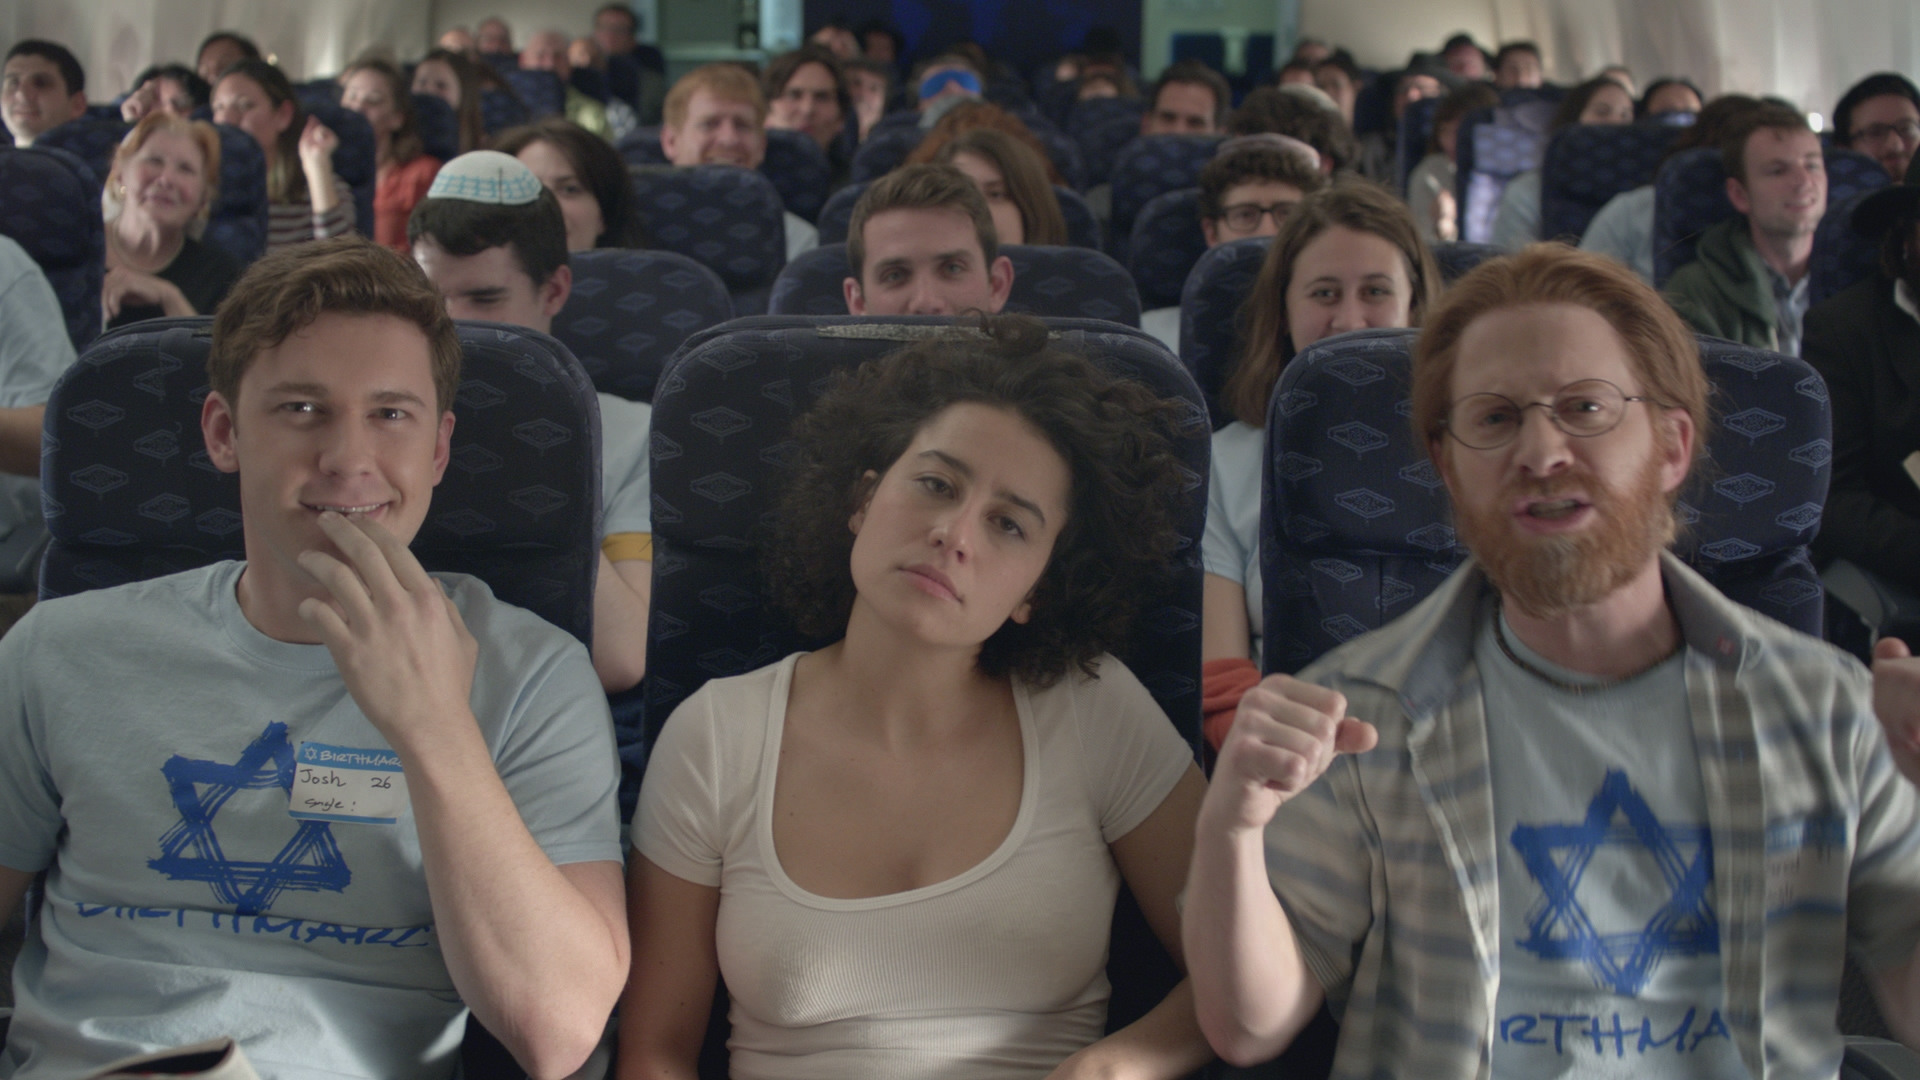 Jews on a Plane